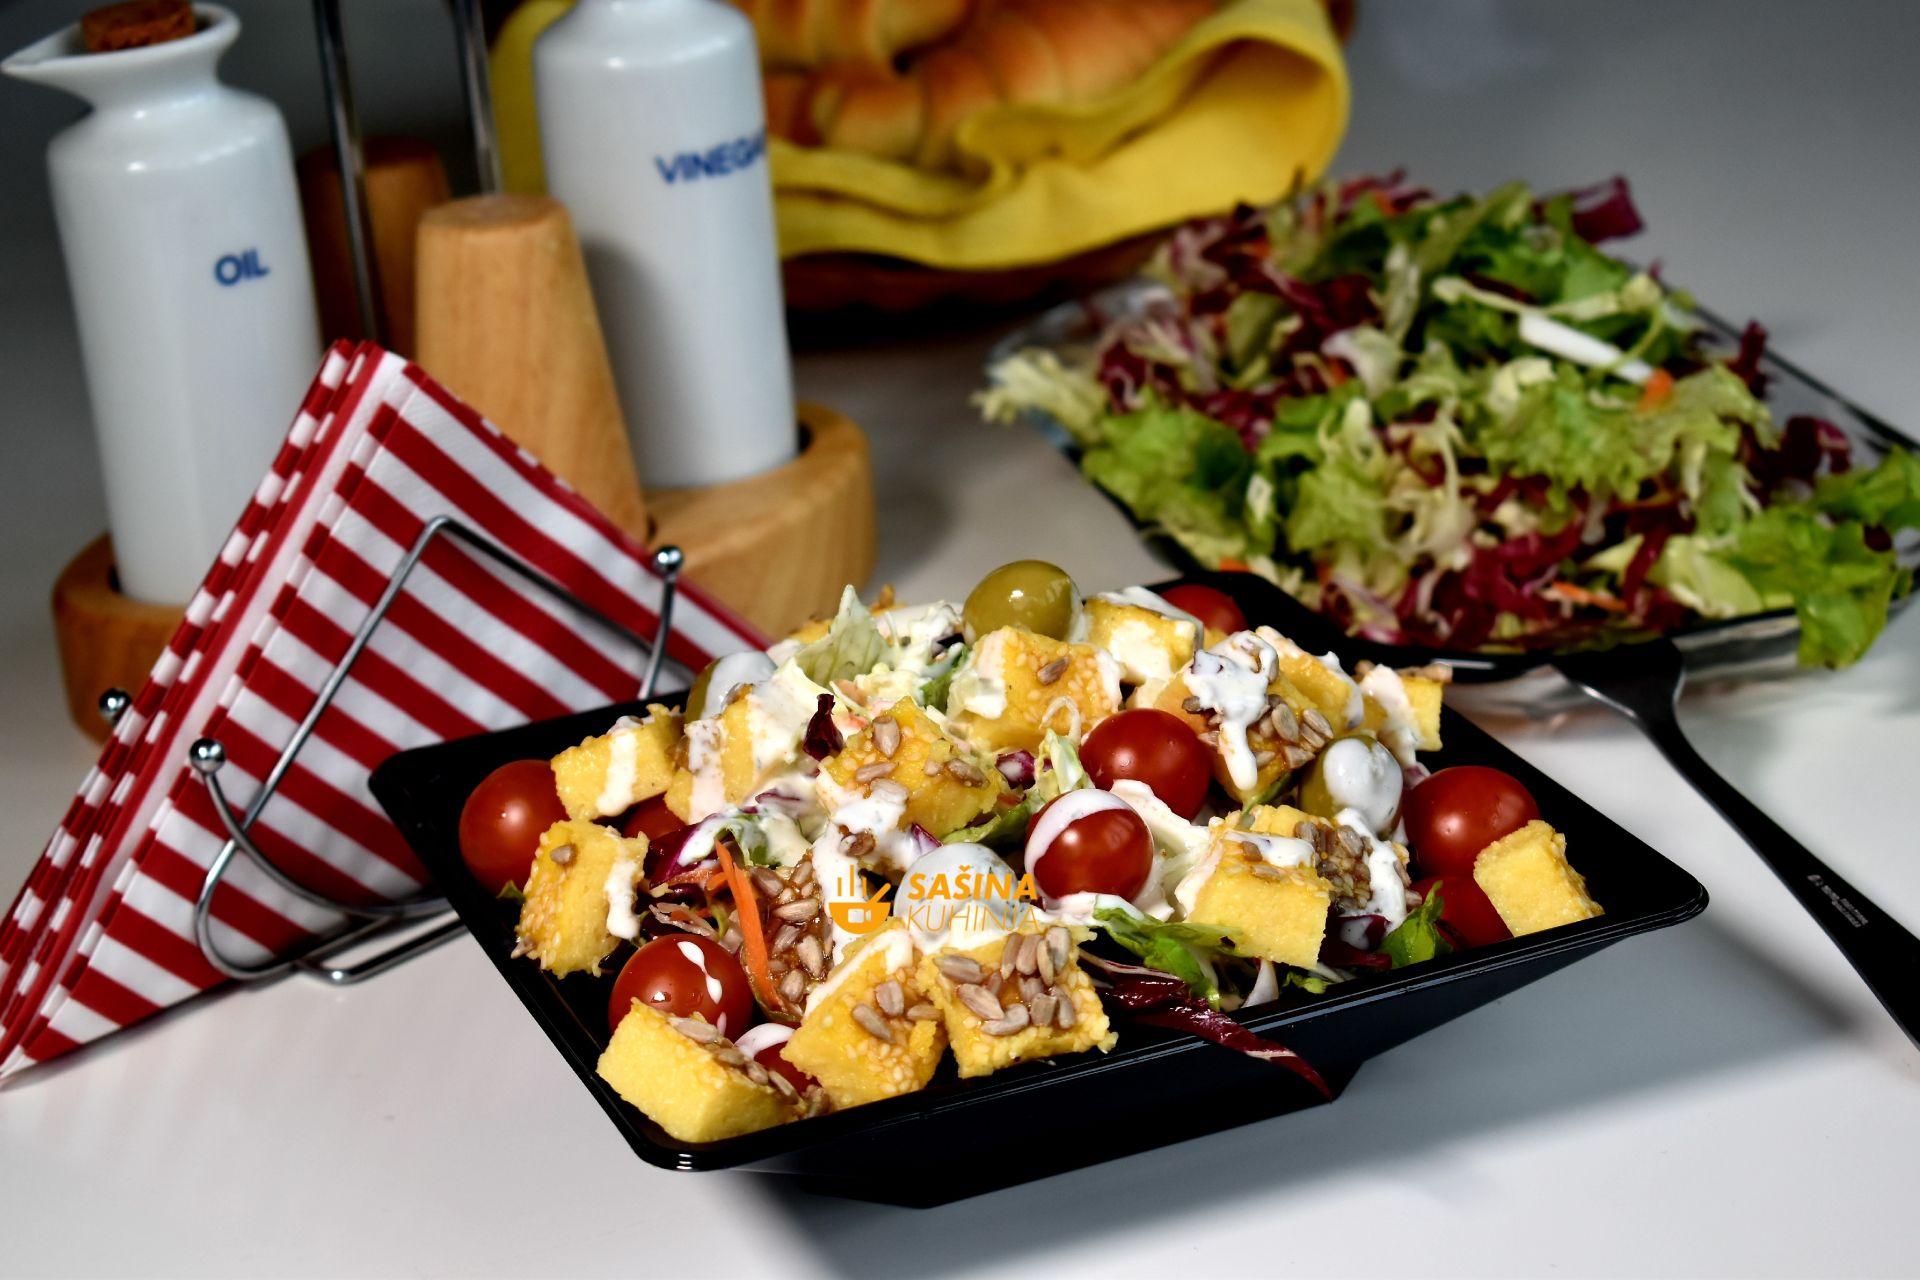 dresing za salatu salata zapečena instant palenta recept za dressing za salate